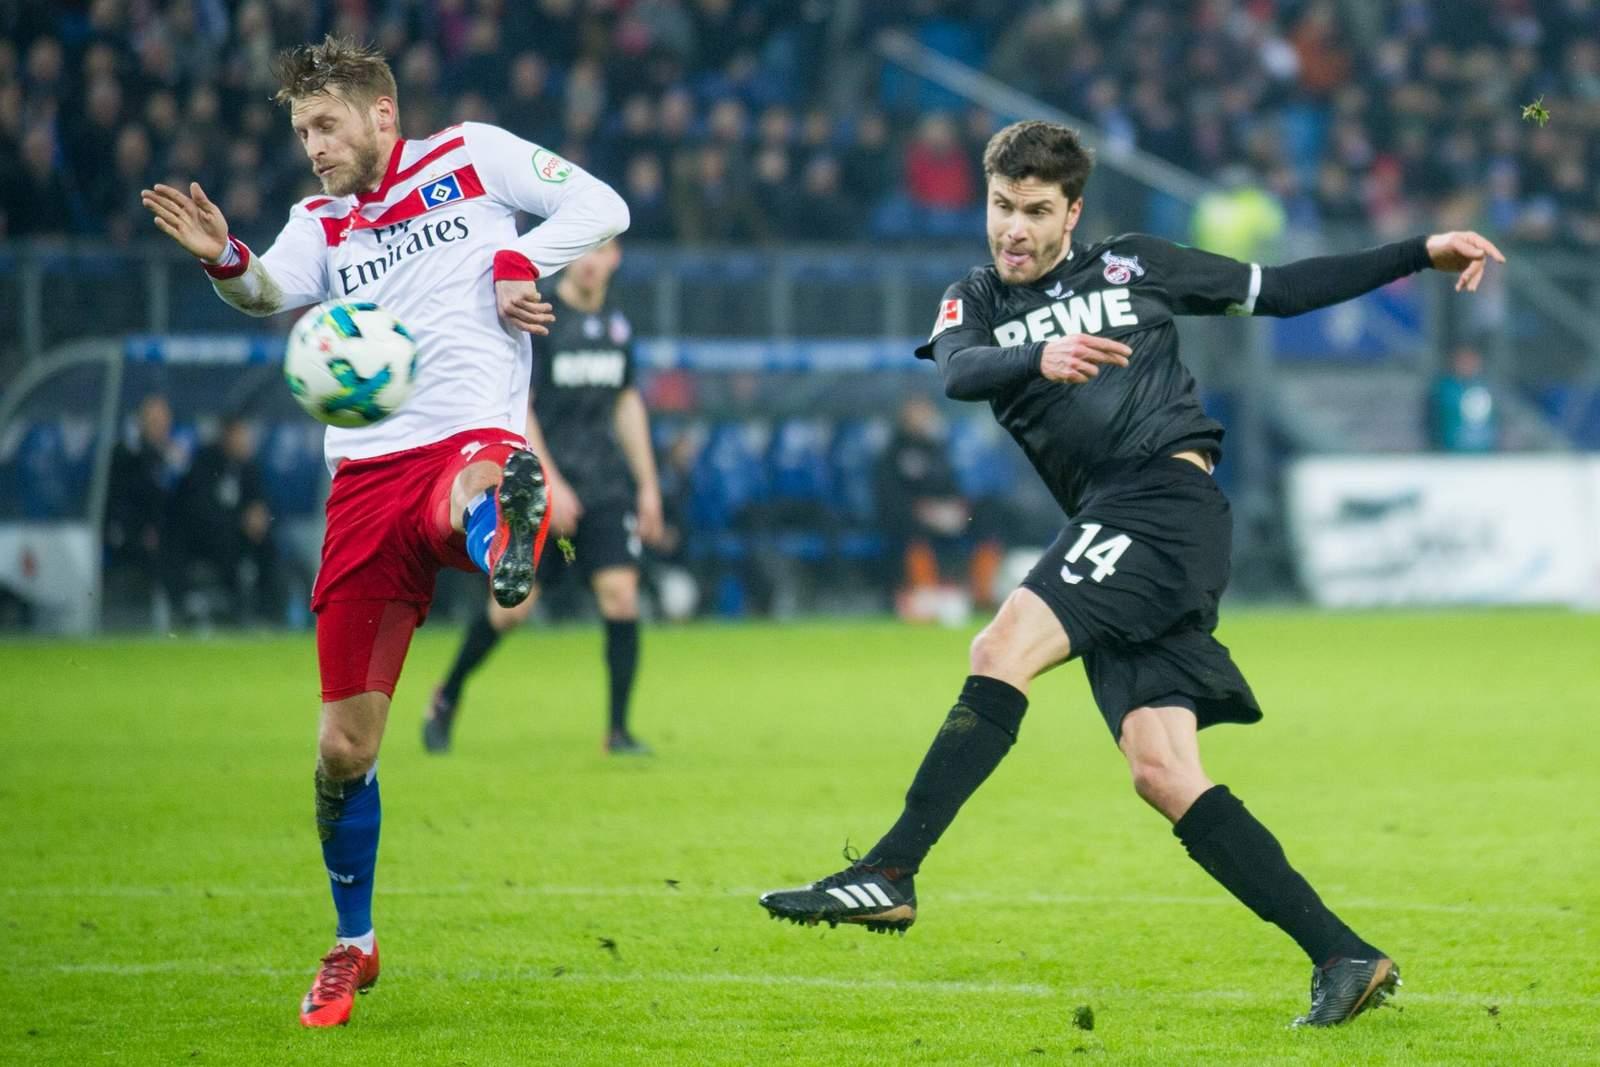 Aaron Hunt vom HSV gegen Jonas Hector vom 1. FC Köln